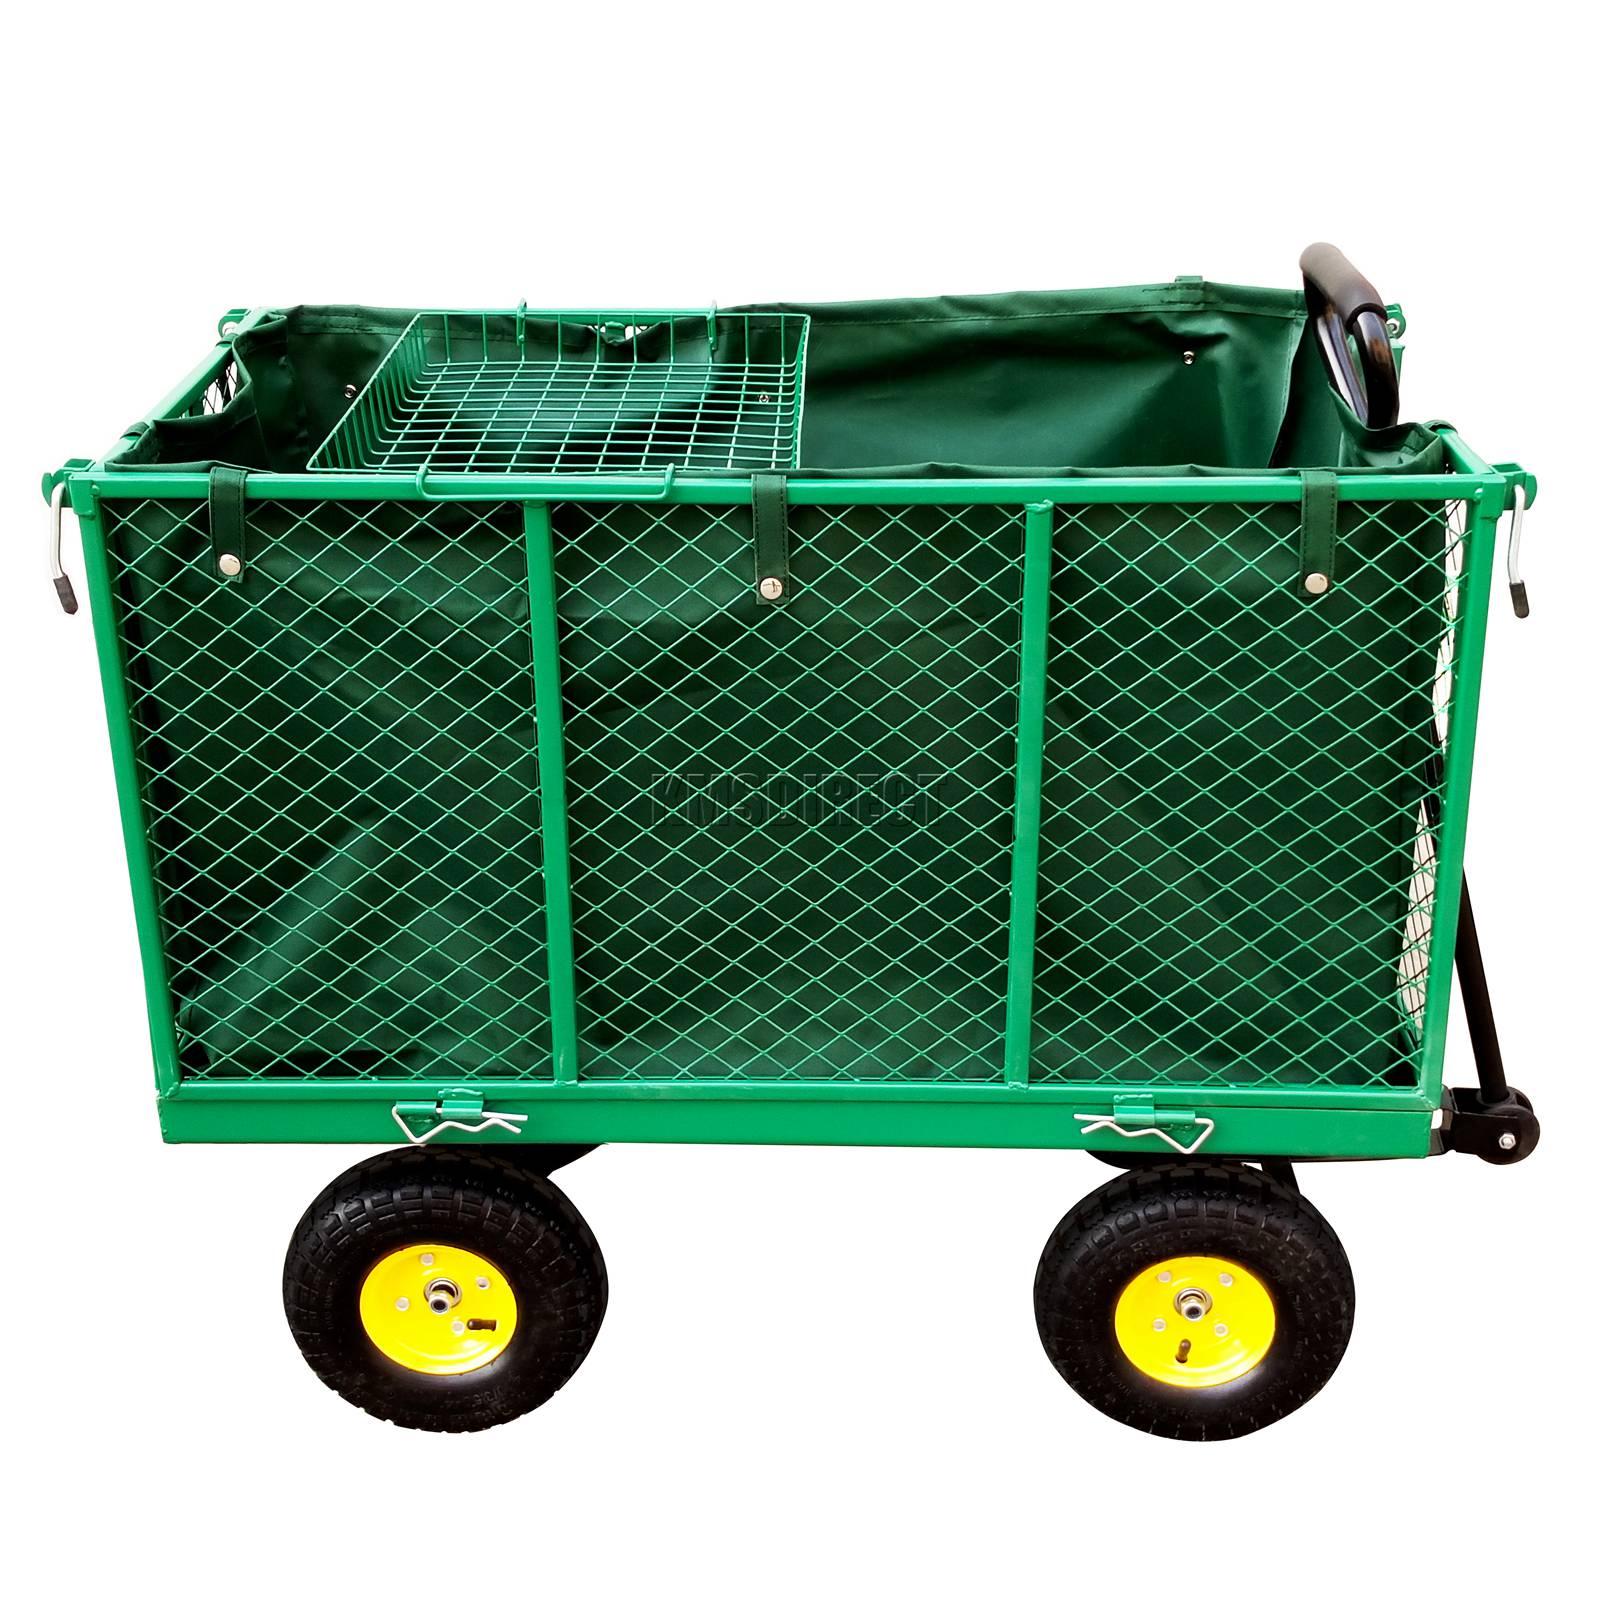 FoxHunter-Heavy-Duty-Garden-Dump-Truck-Tipping-Trailer-Trolley-Cart-Wheelbarrow miniatuur 15